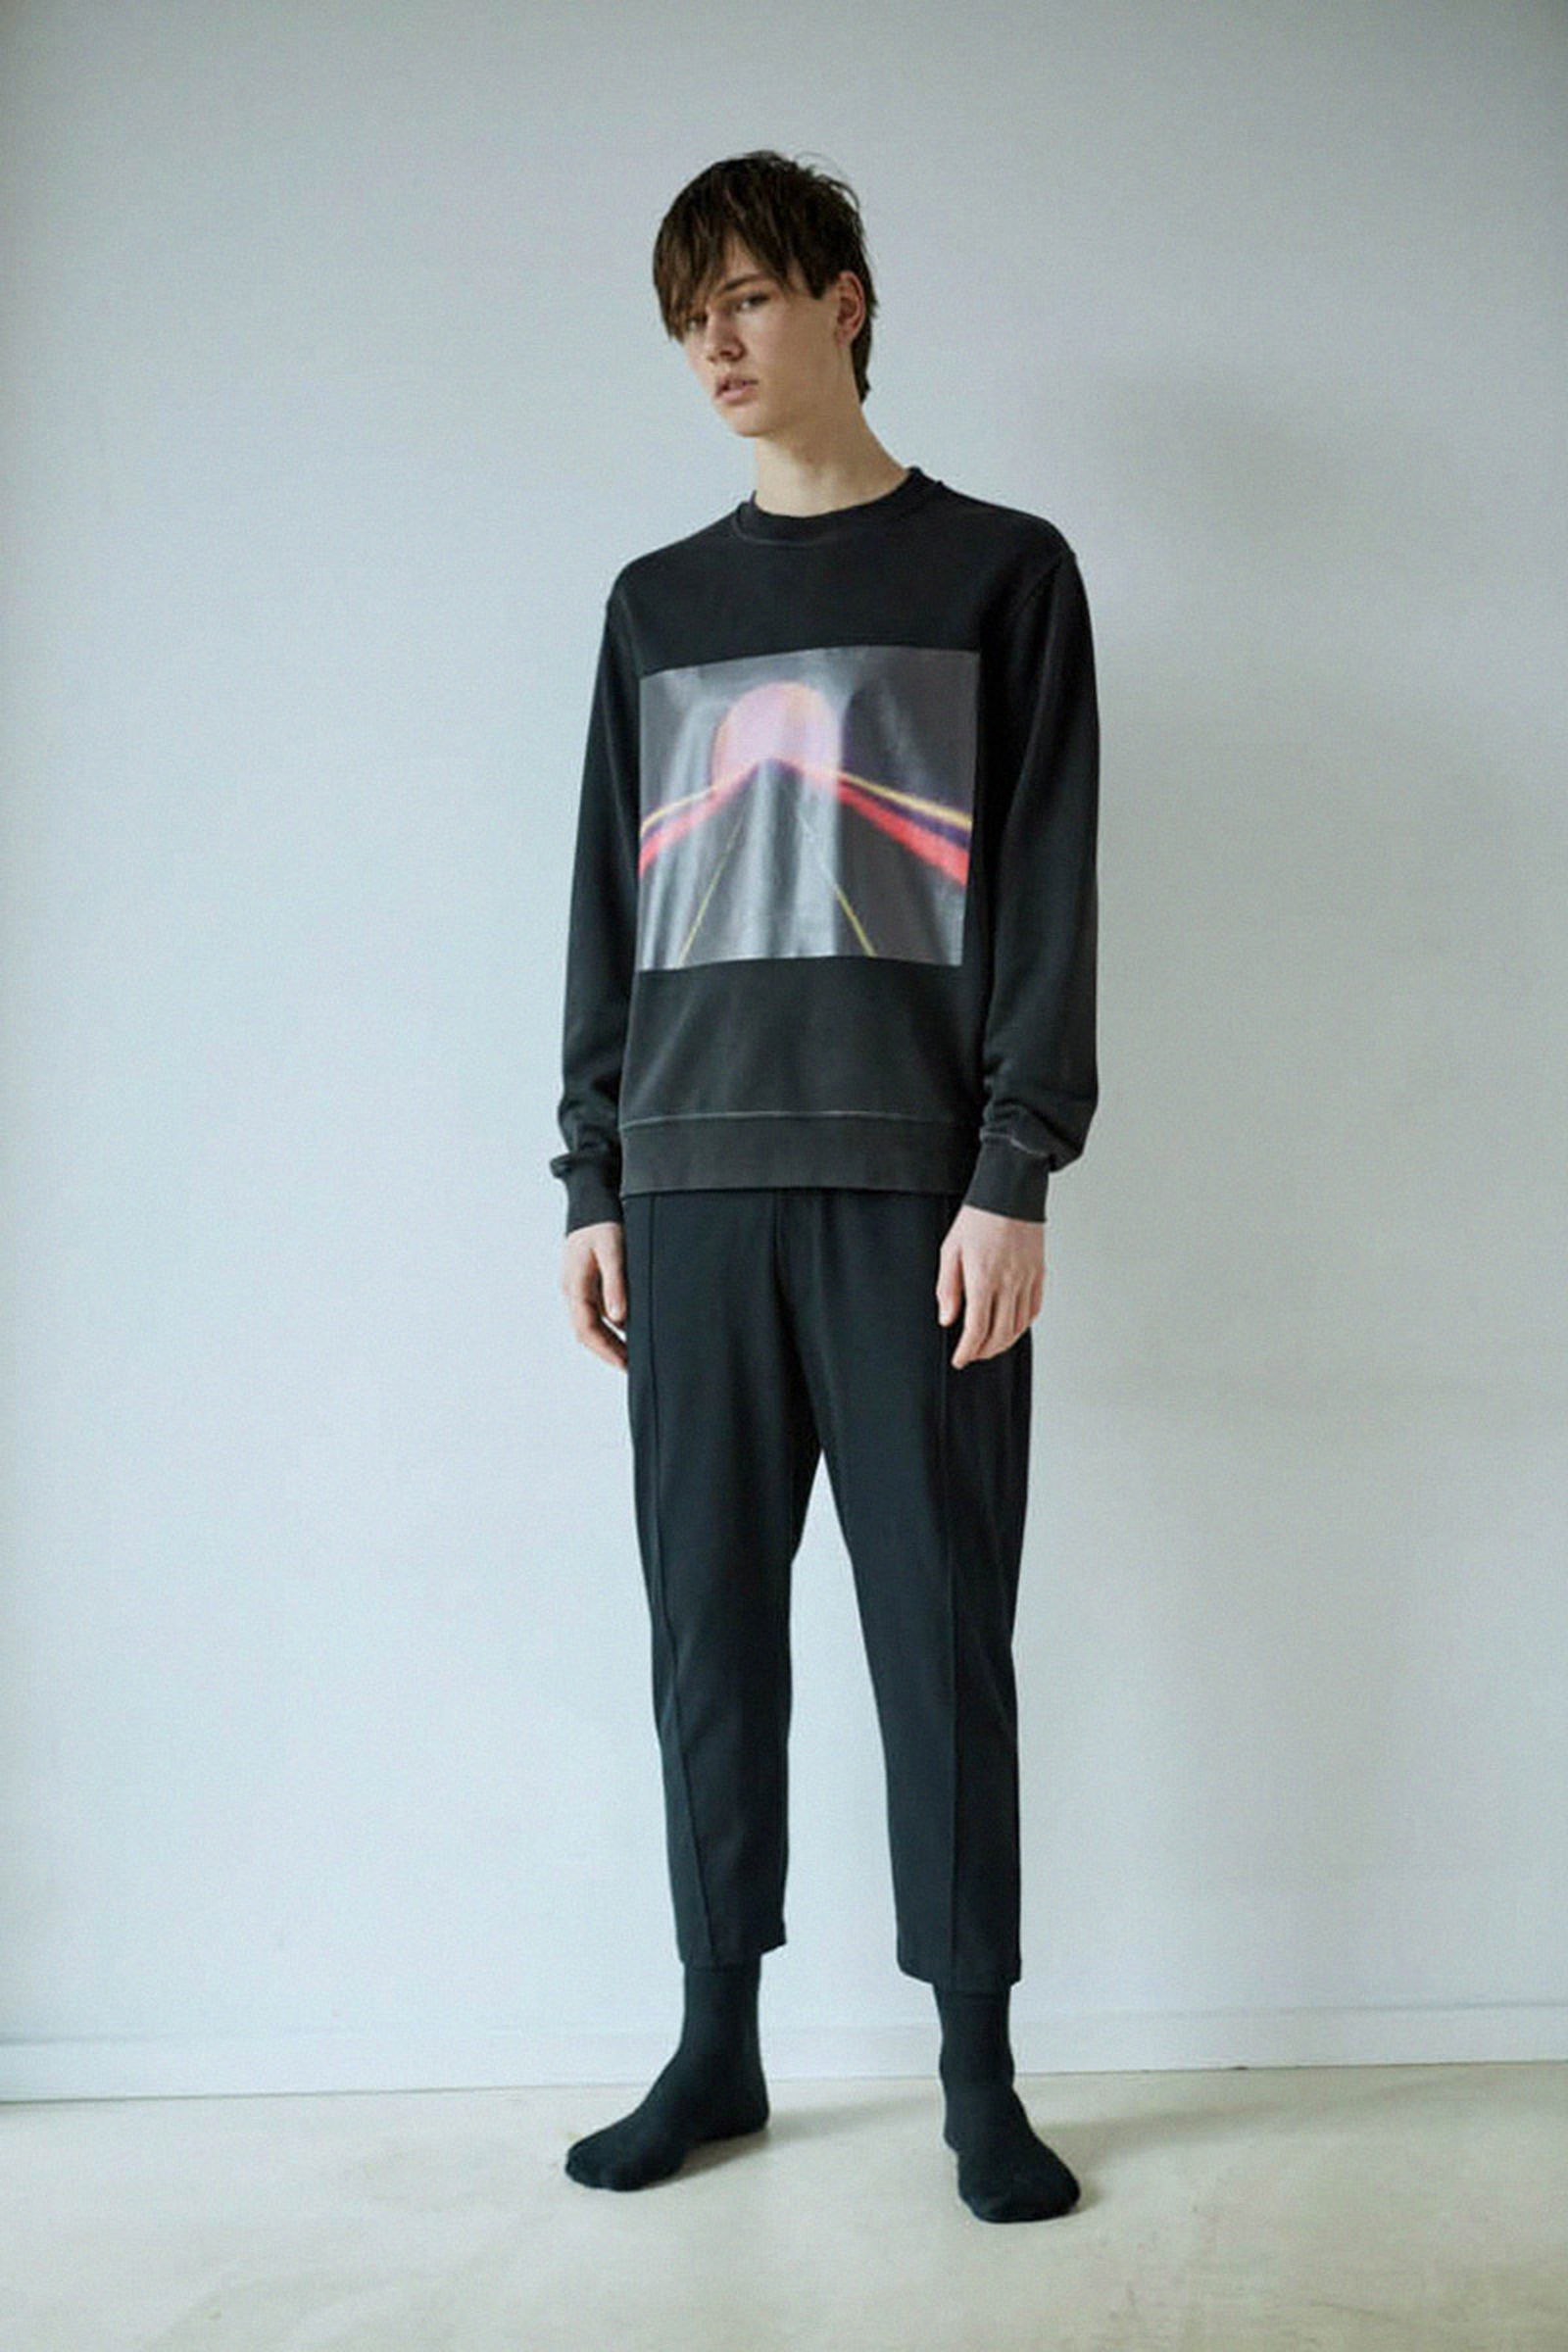 german clothing brands amh 023c Adidas Boulezar